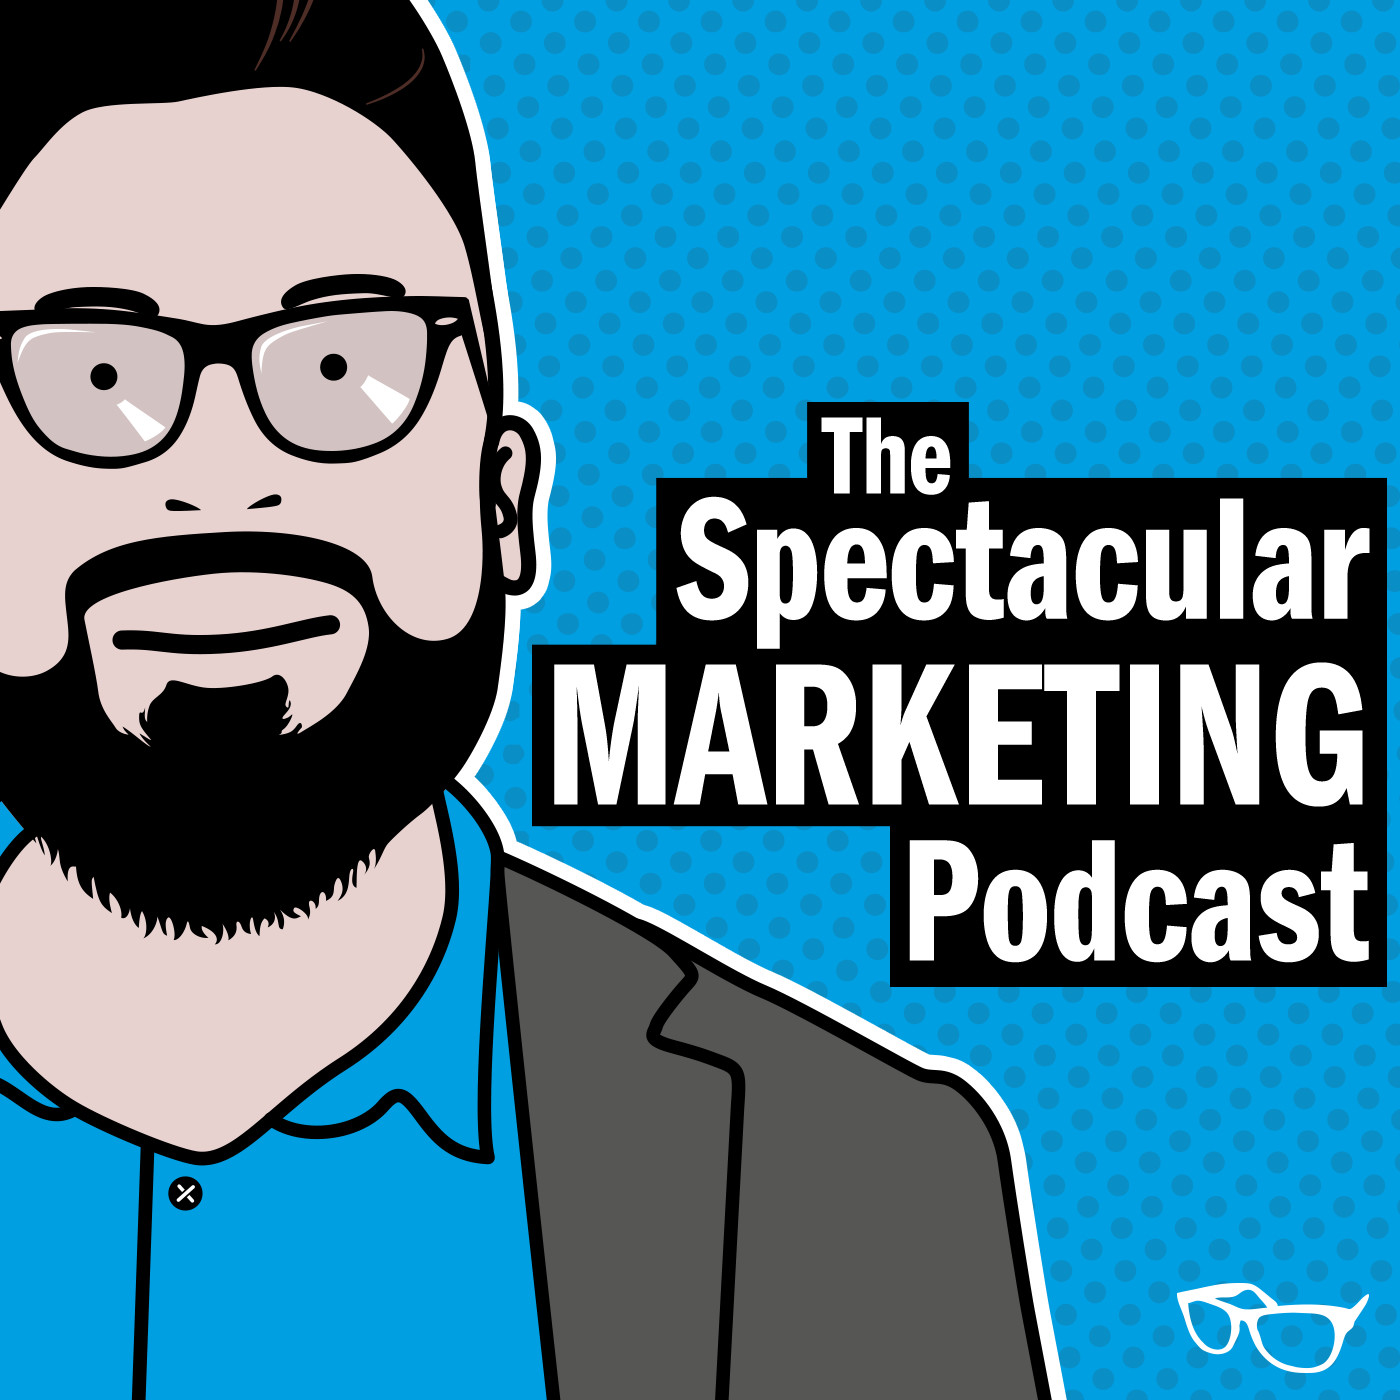 The Spectacular Marketing podc